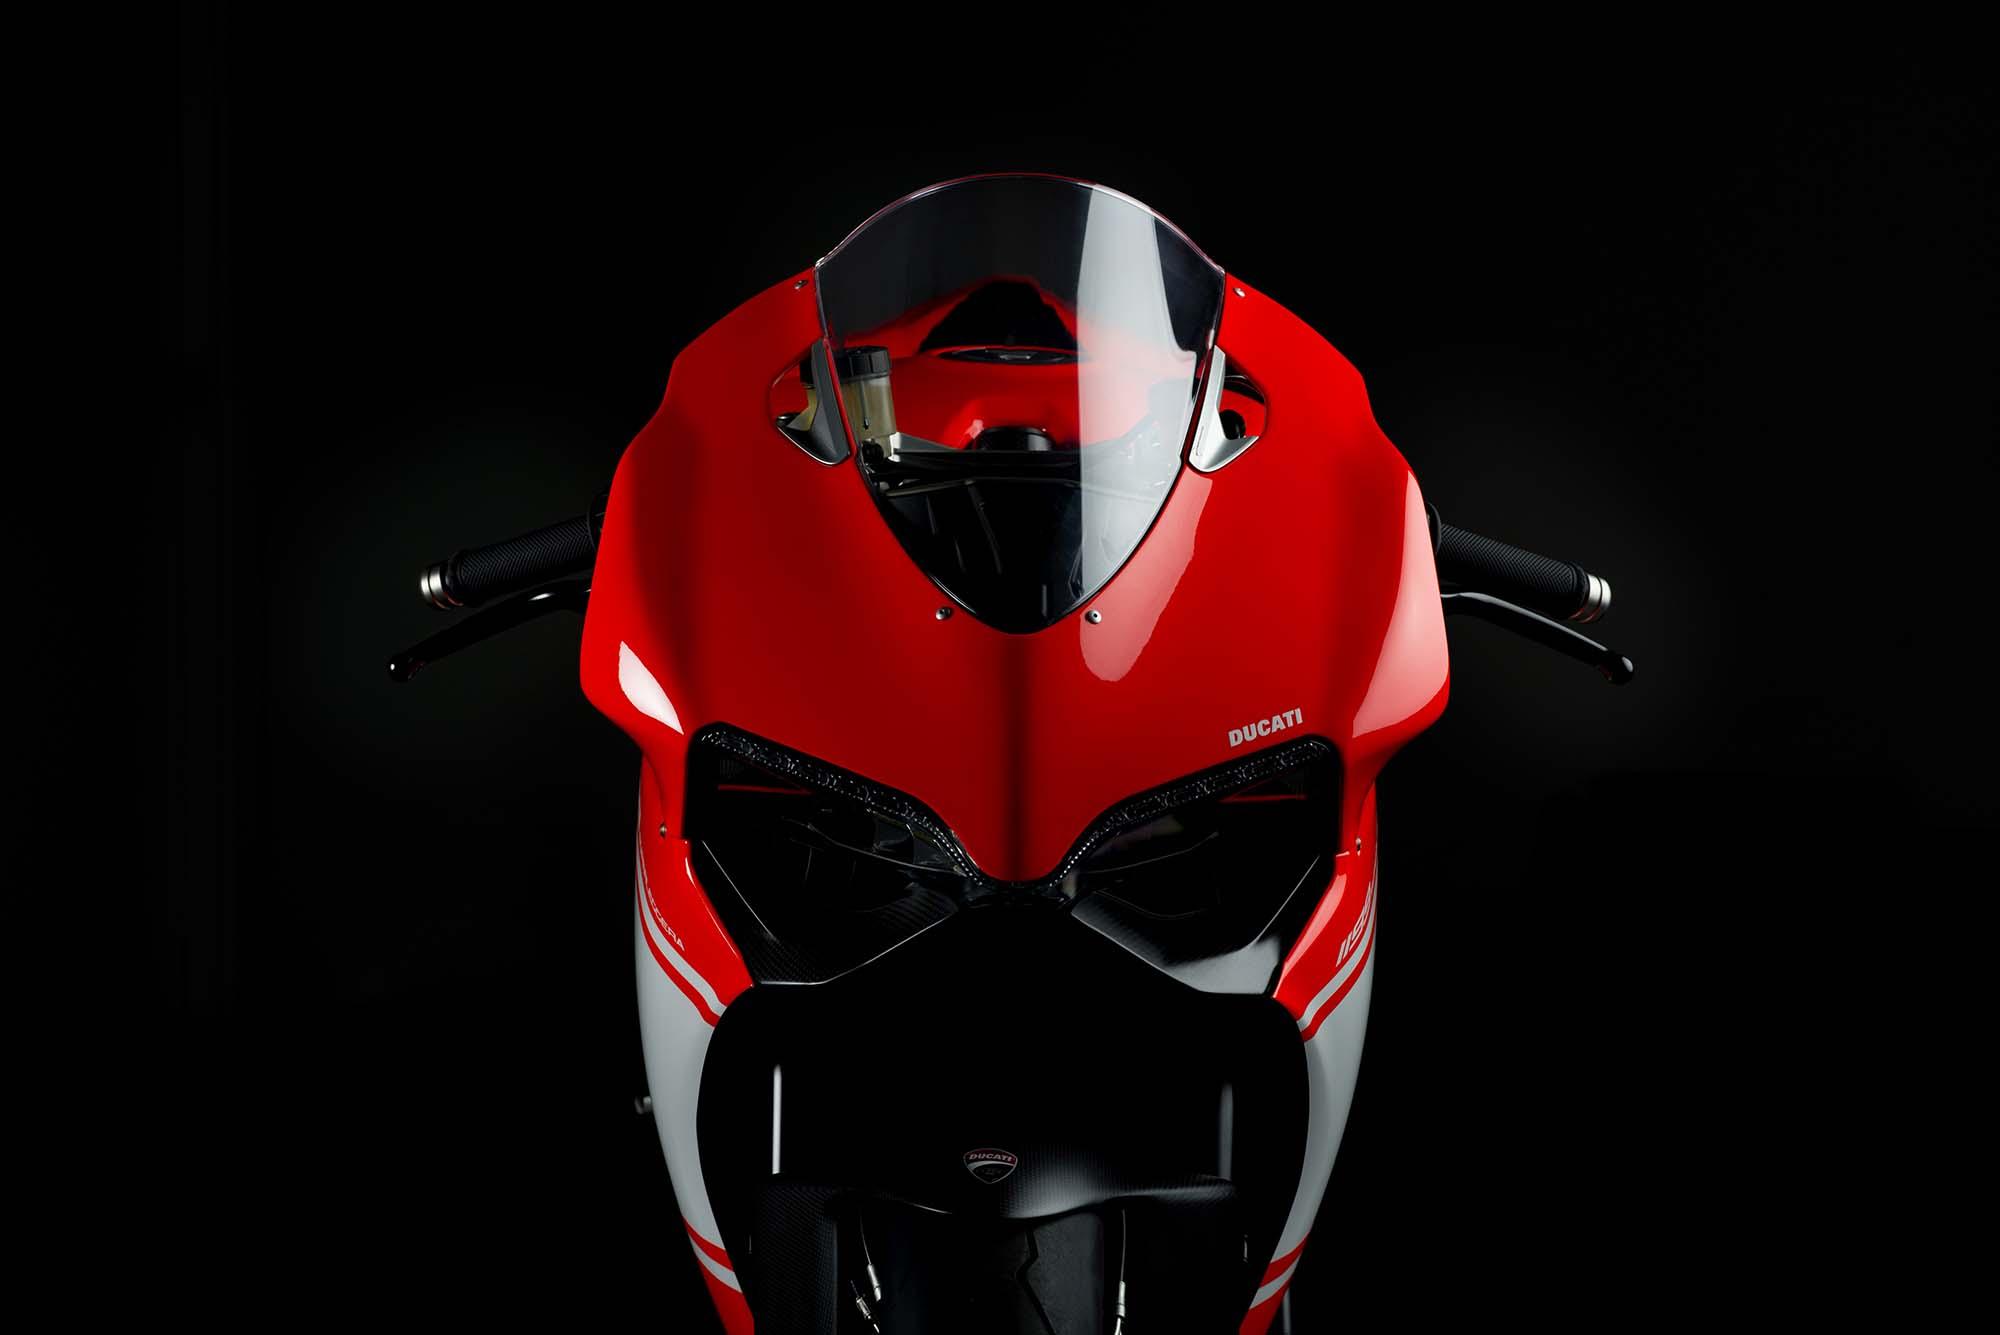 A Ducati 1299 Superleggera With A Carbon Fiber Frame